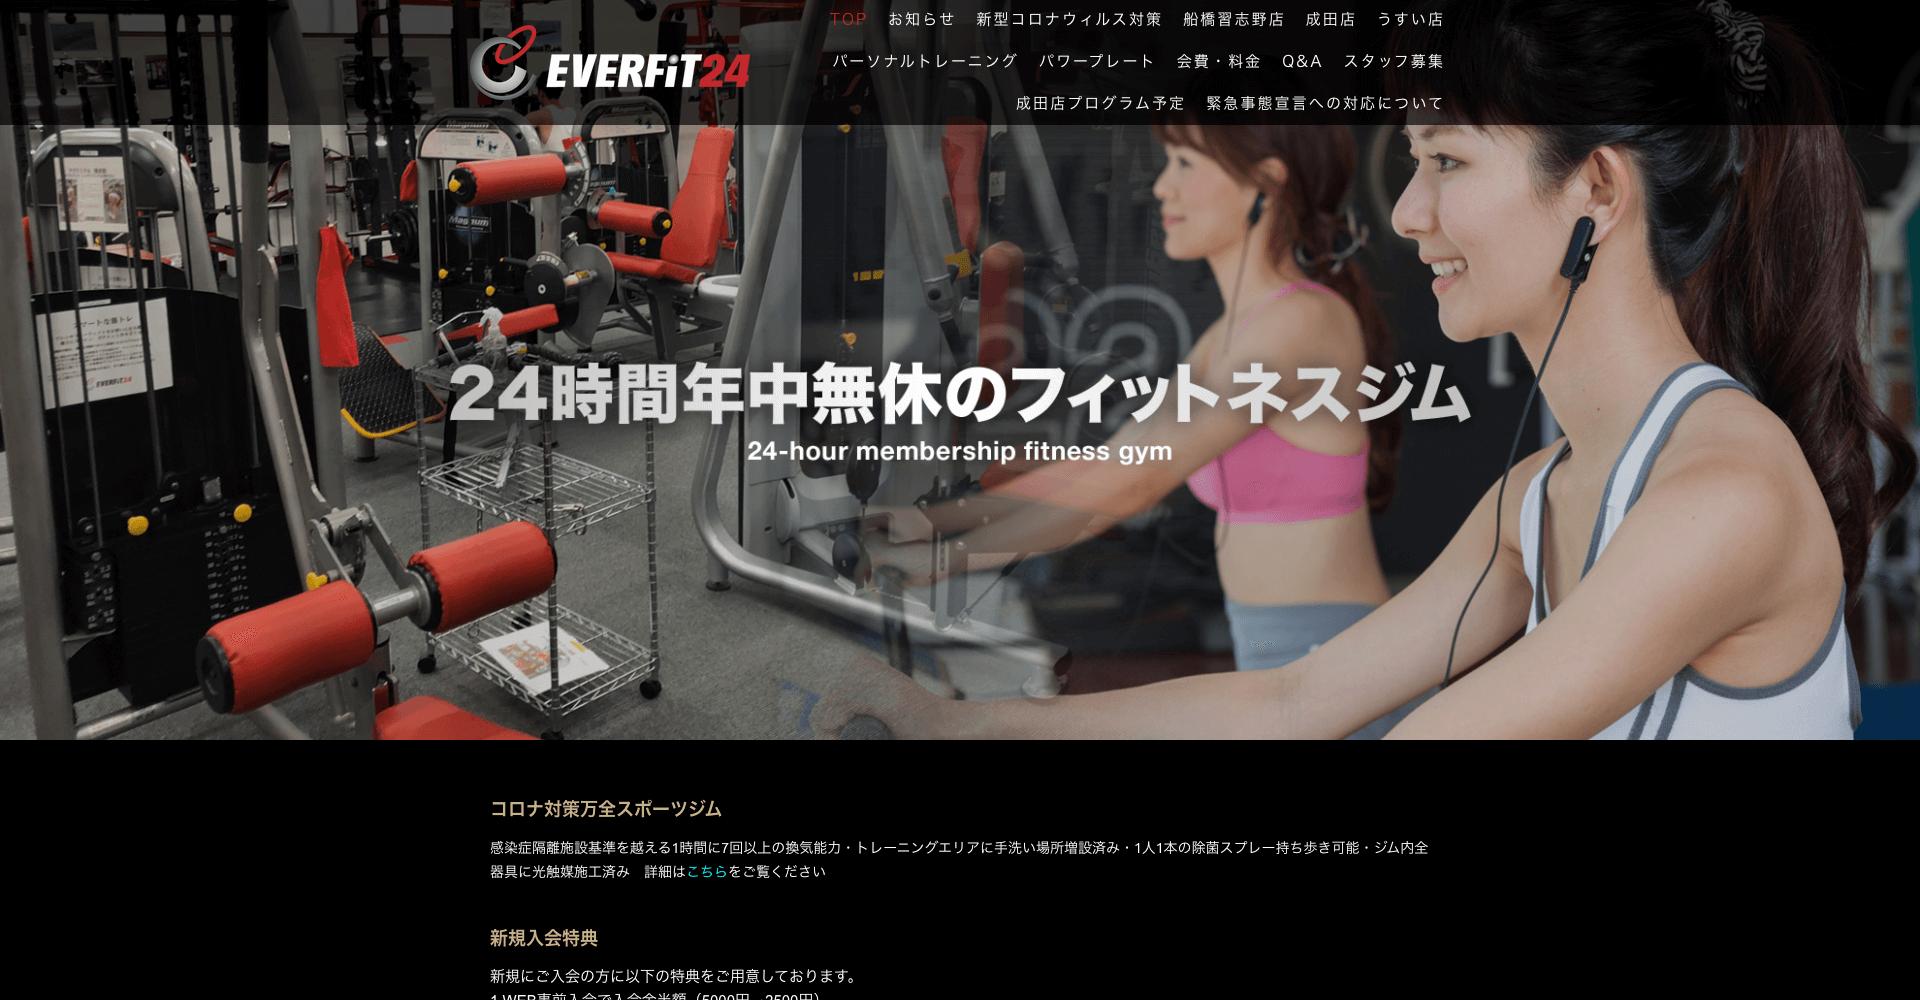 EVERFiT24(エバーフィット24)